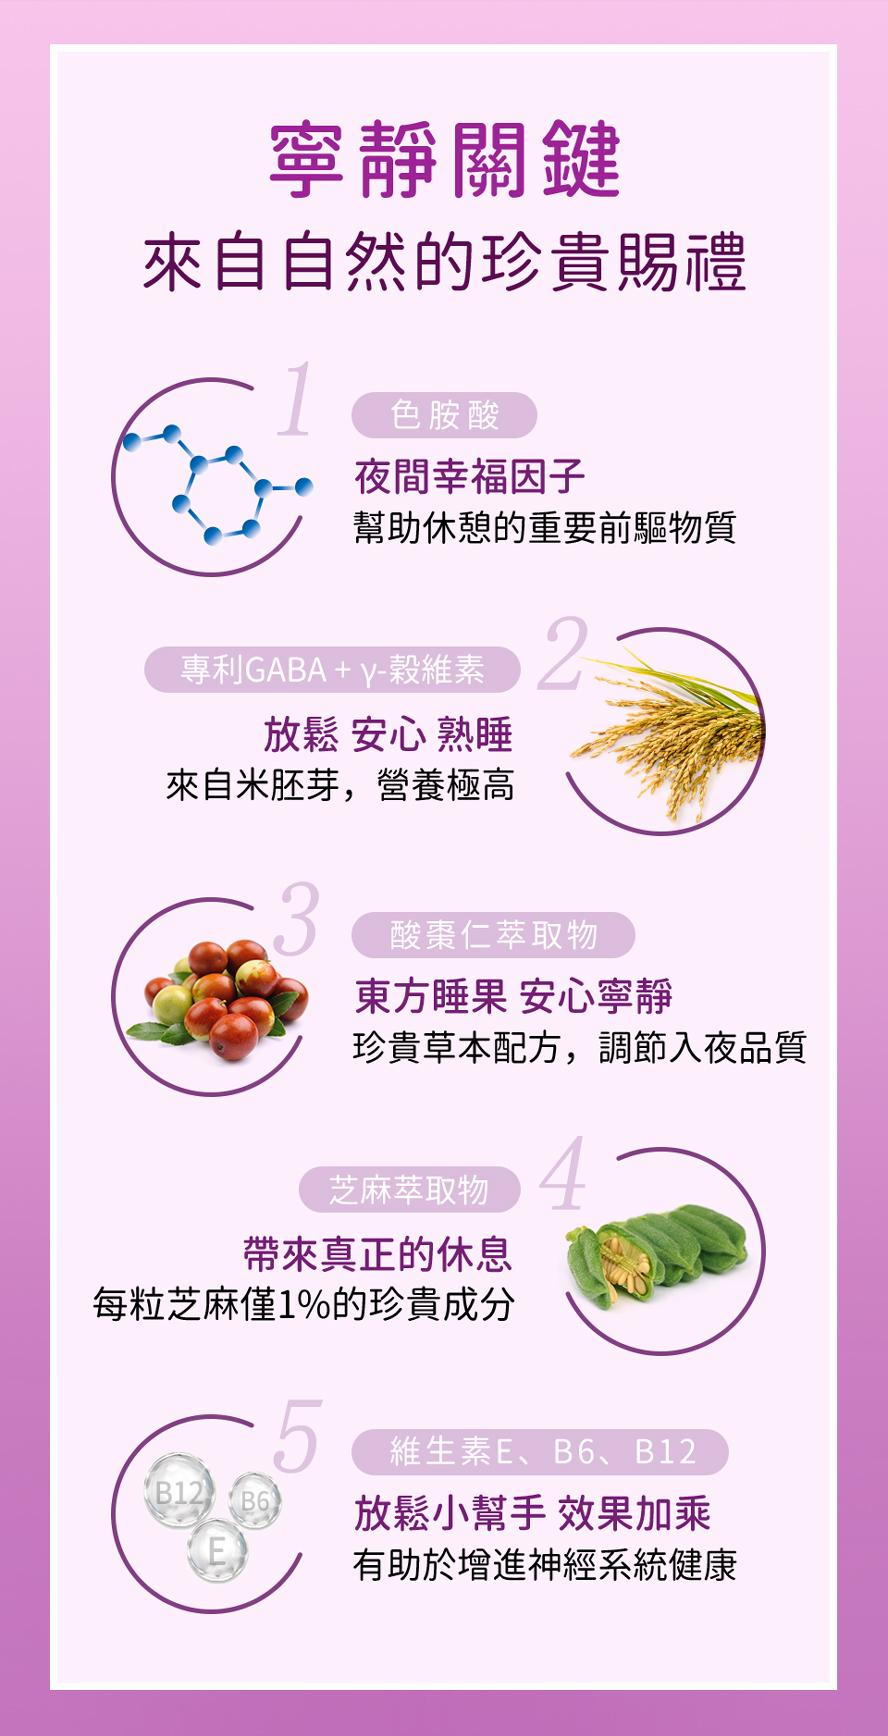 BHK's夜萃膠囊特別採用素食膠囊,讓素食者也可以食用